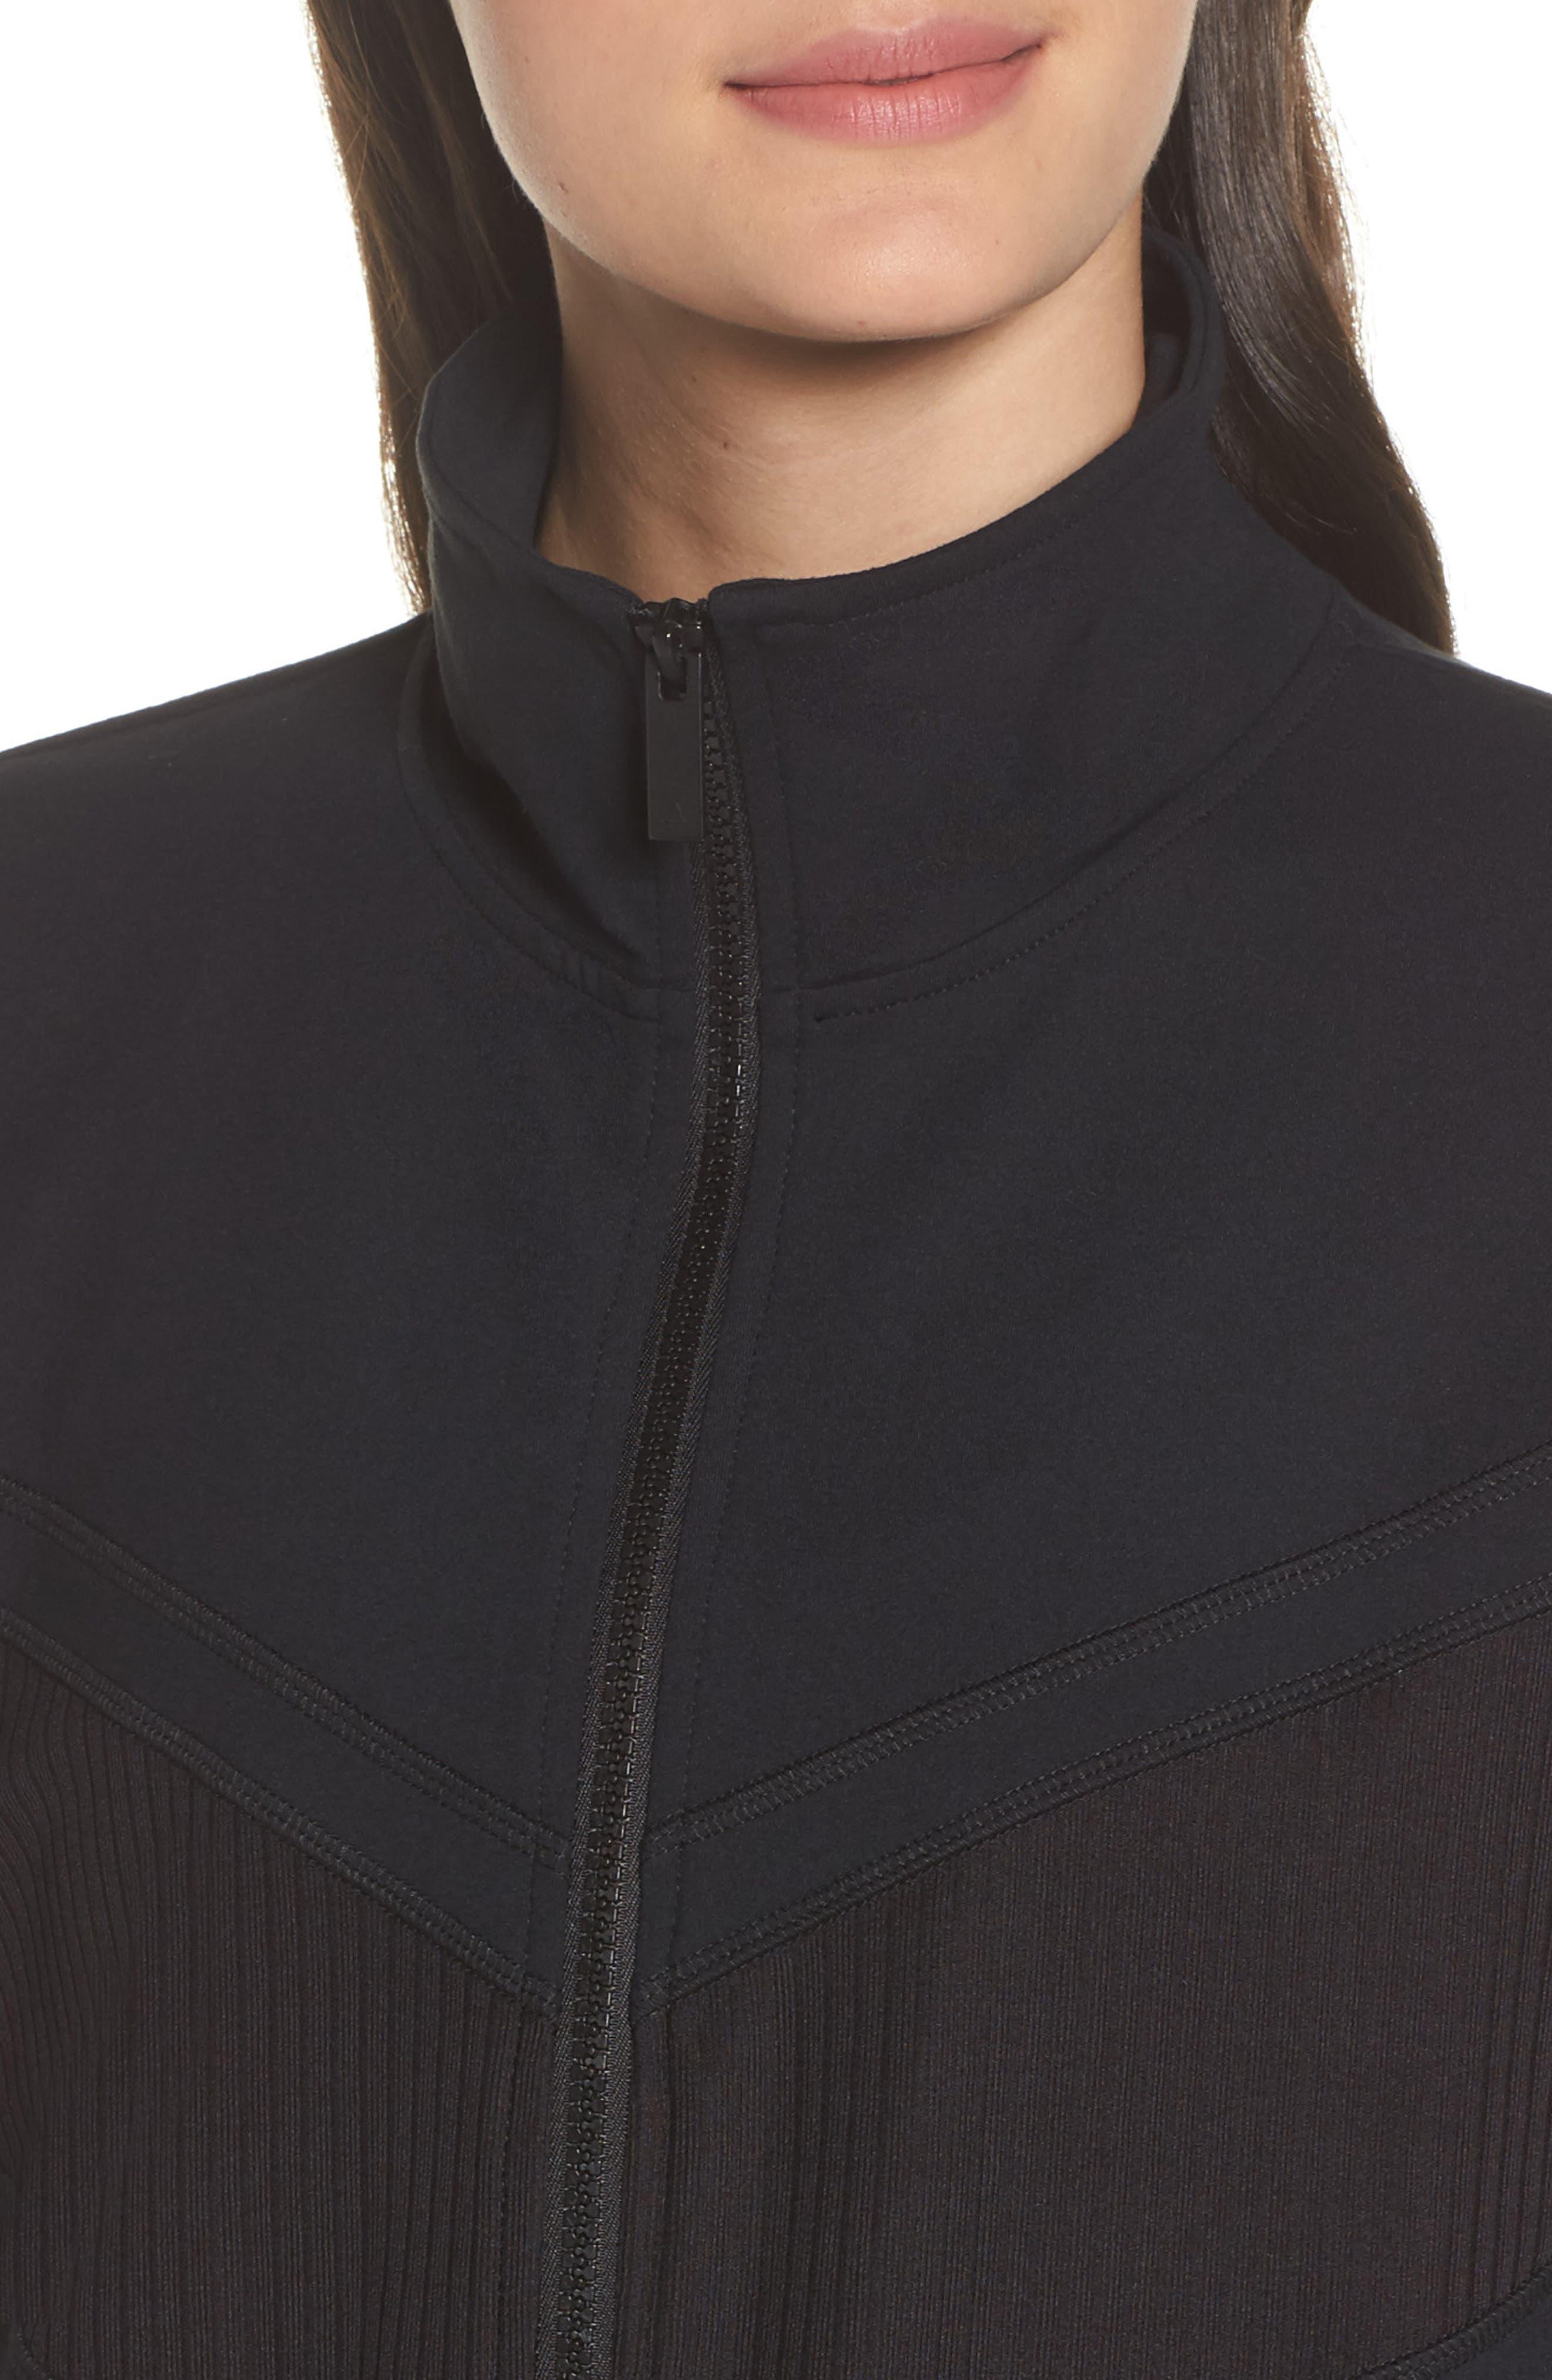 Cato Quarter Zip Pullover,                             Alternate thumbnail 4, color,                             001